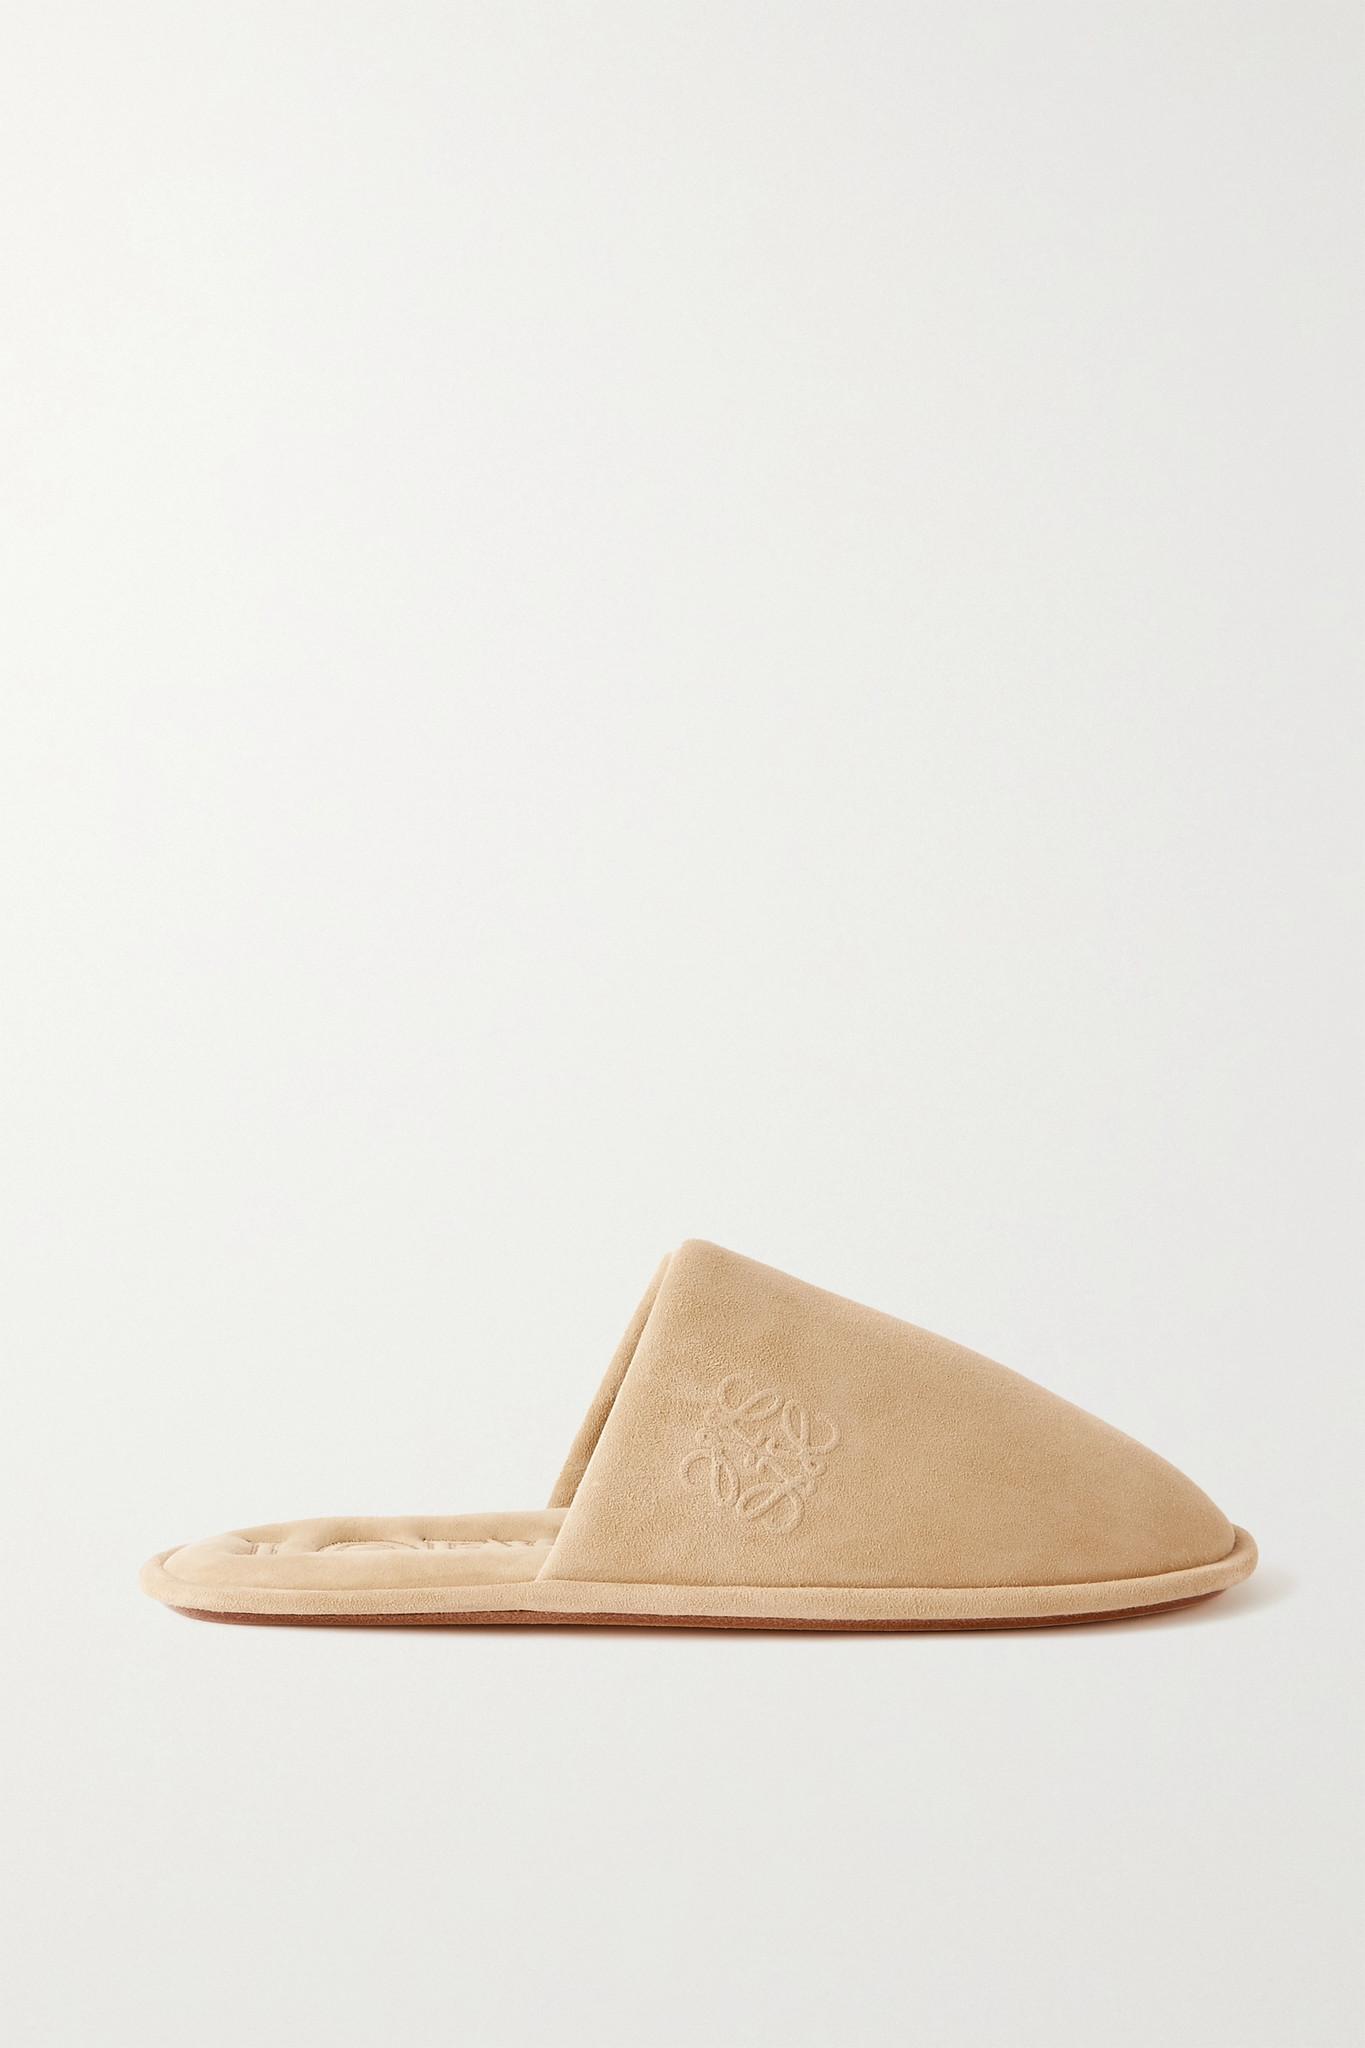 LOEWE - 绒面革拖鞋 - 中性色 - IT38